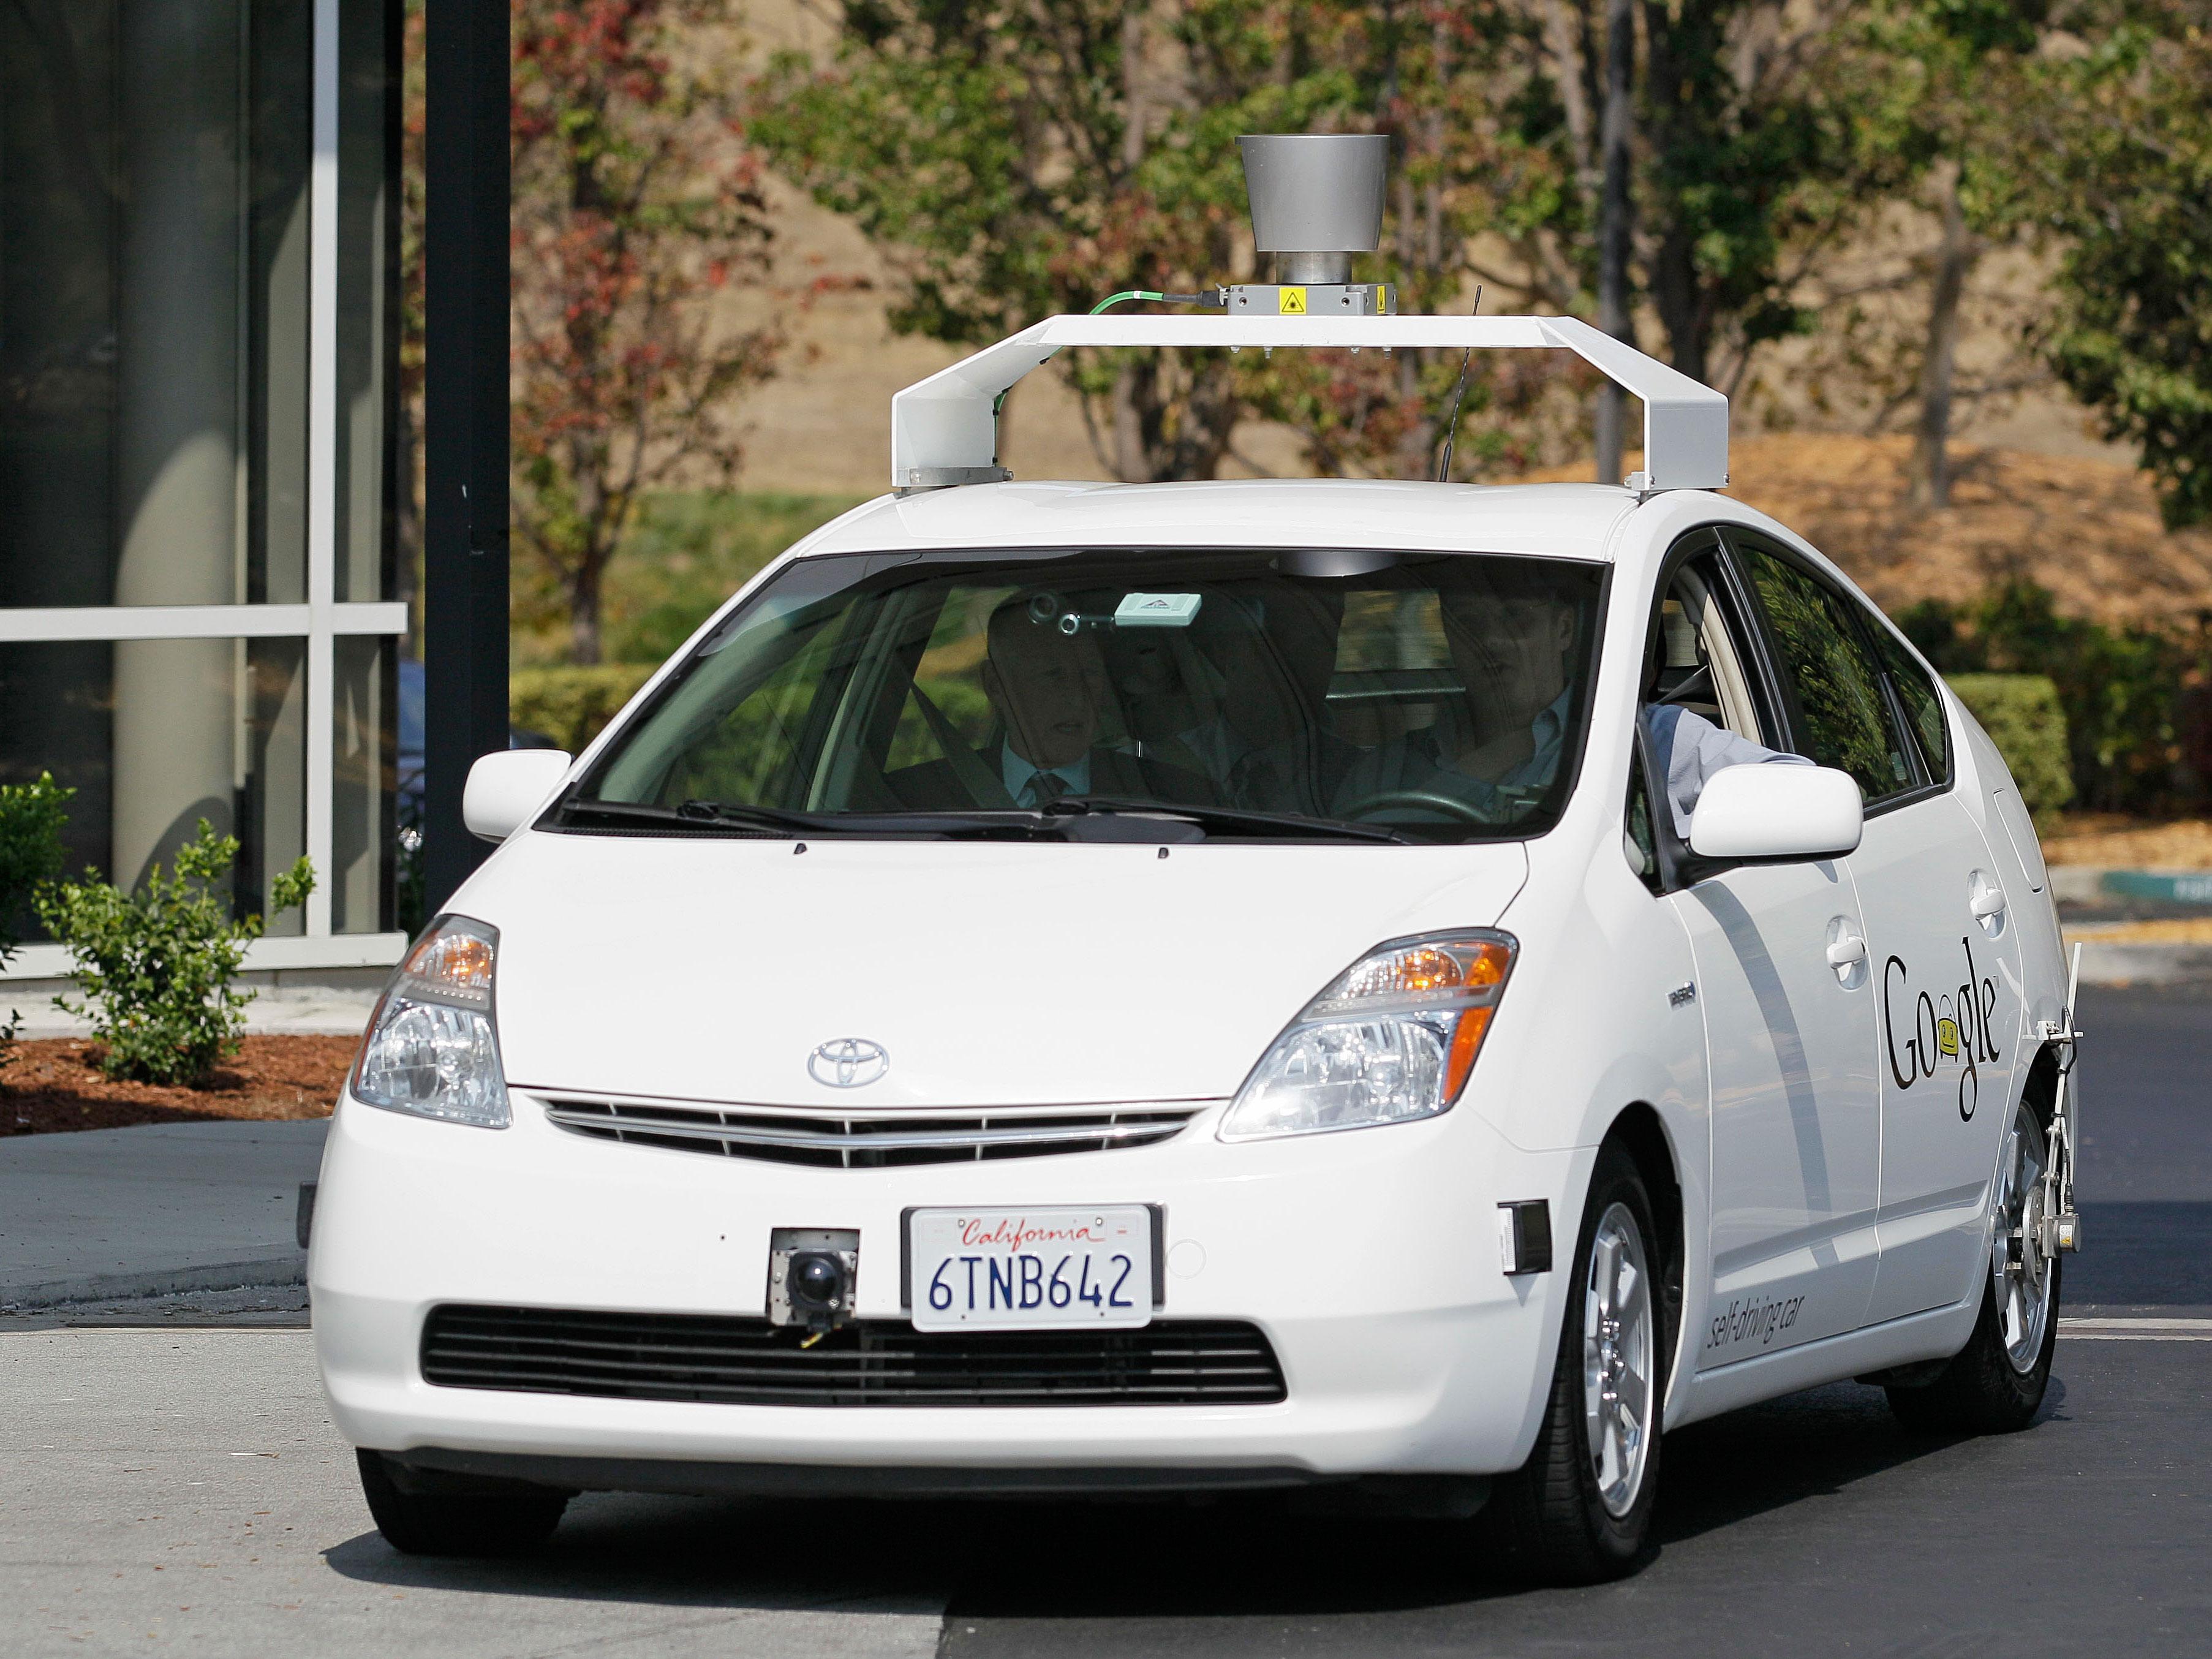 U0027Three Revolutions In Urban Transportationu0027 Sees A Driverless Car Future  Between Yolo And Sacramento Counties   Capradio.org